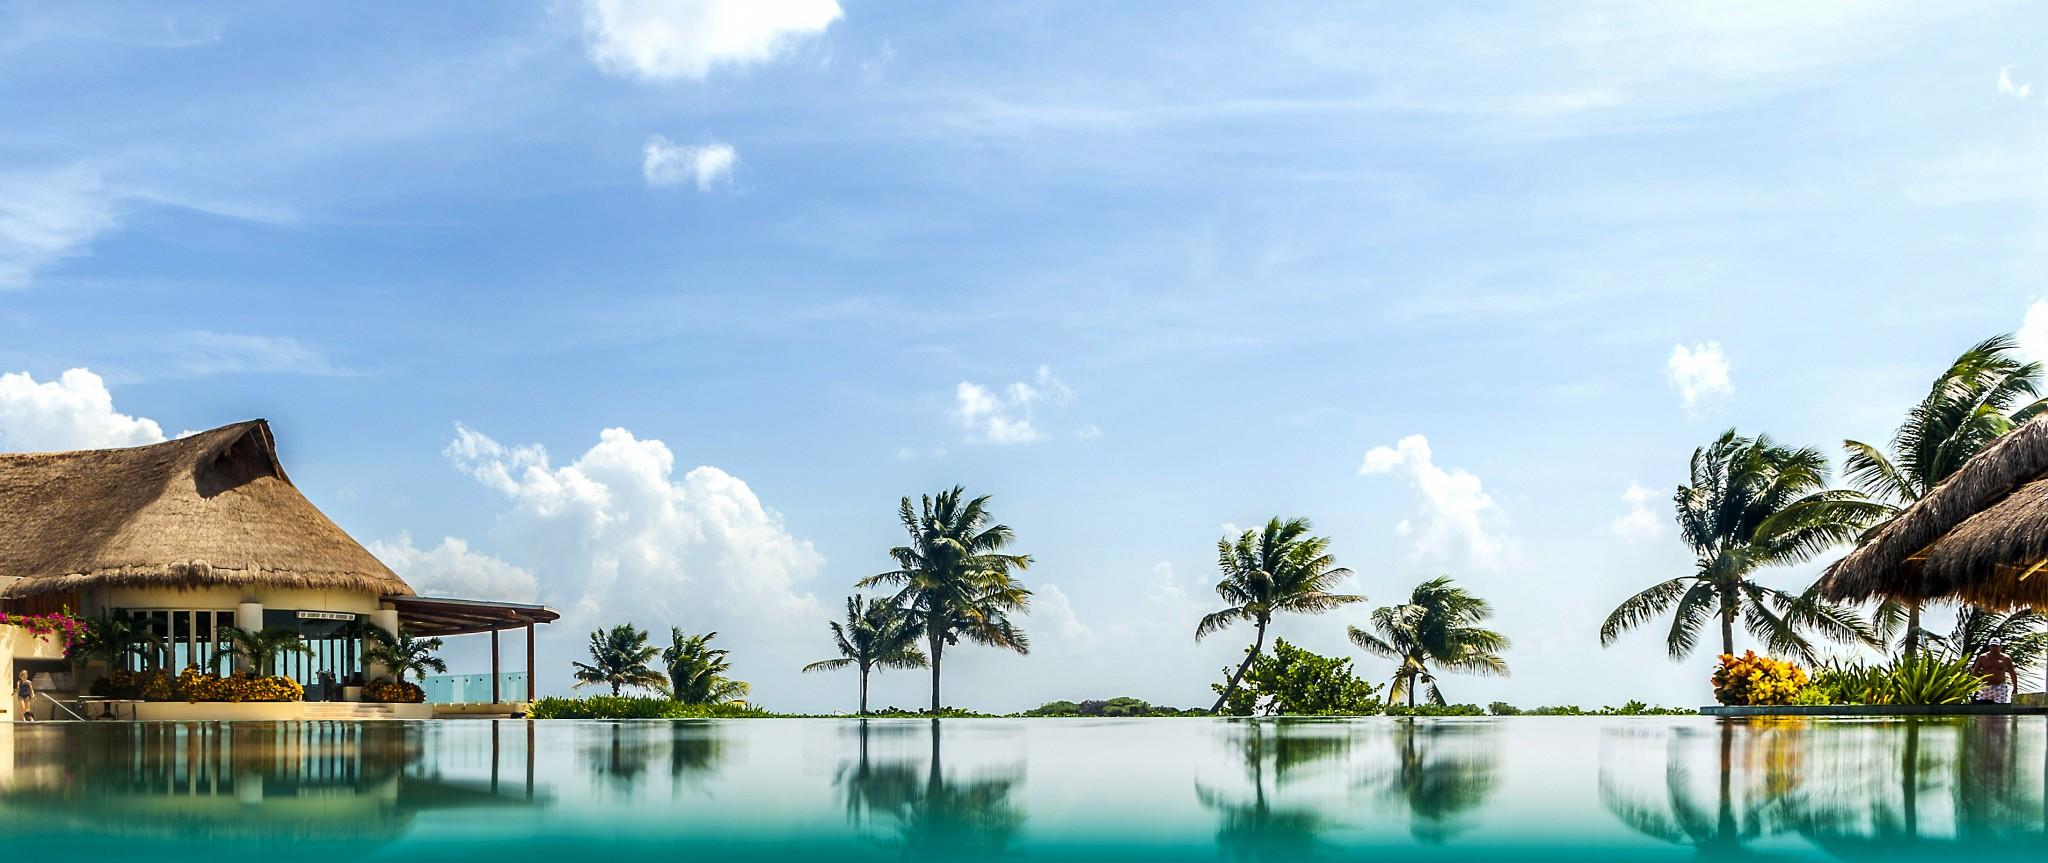 Travel Agency All-Inclusive Resort Grand Velas Riviera Maya 012